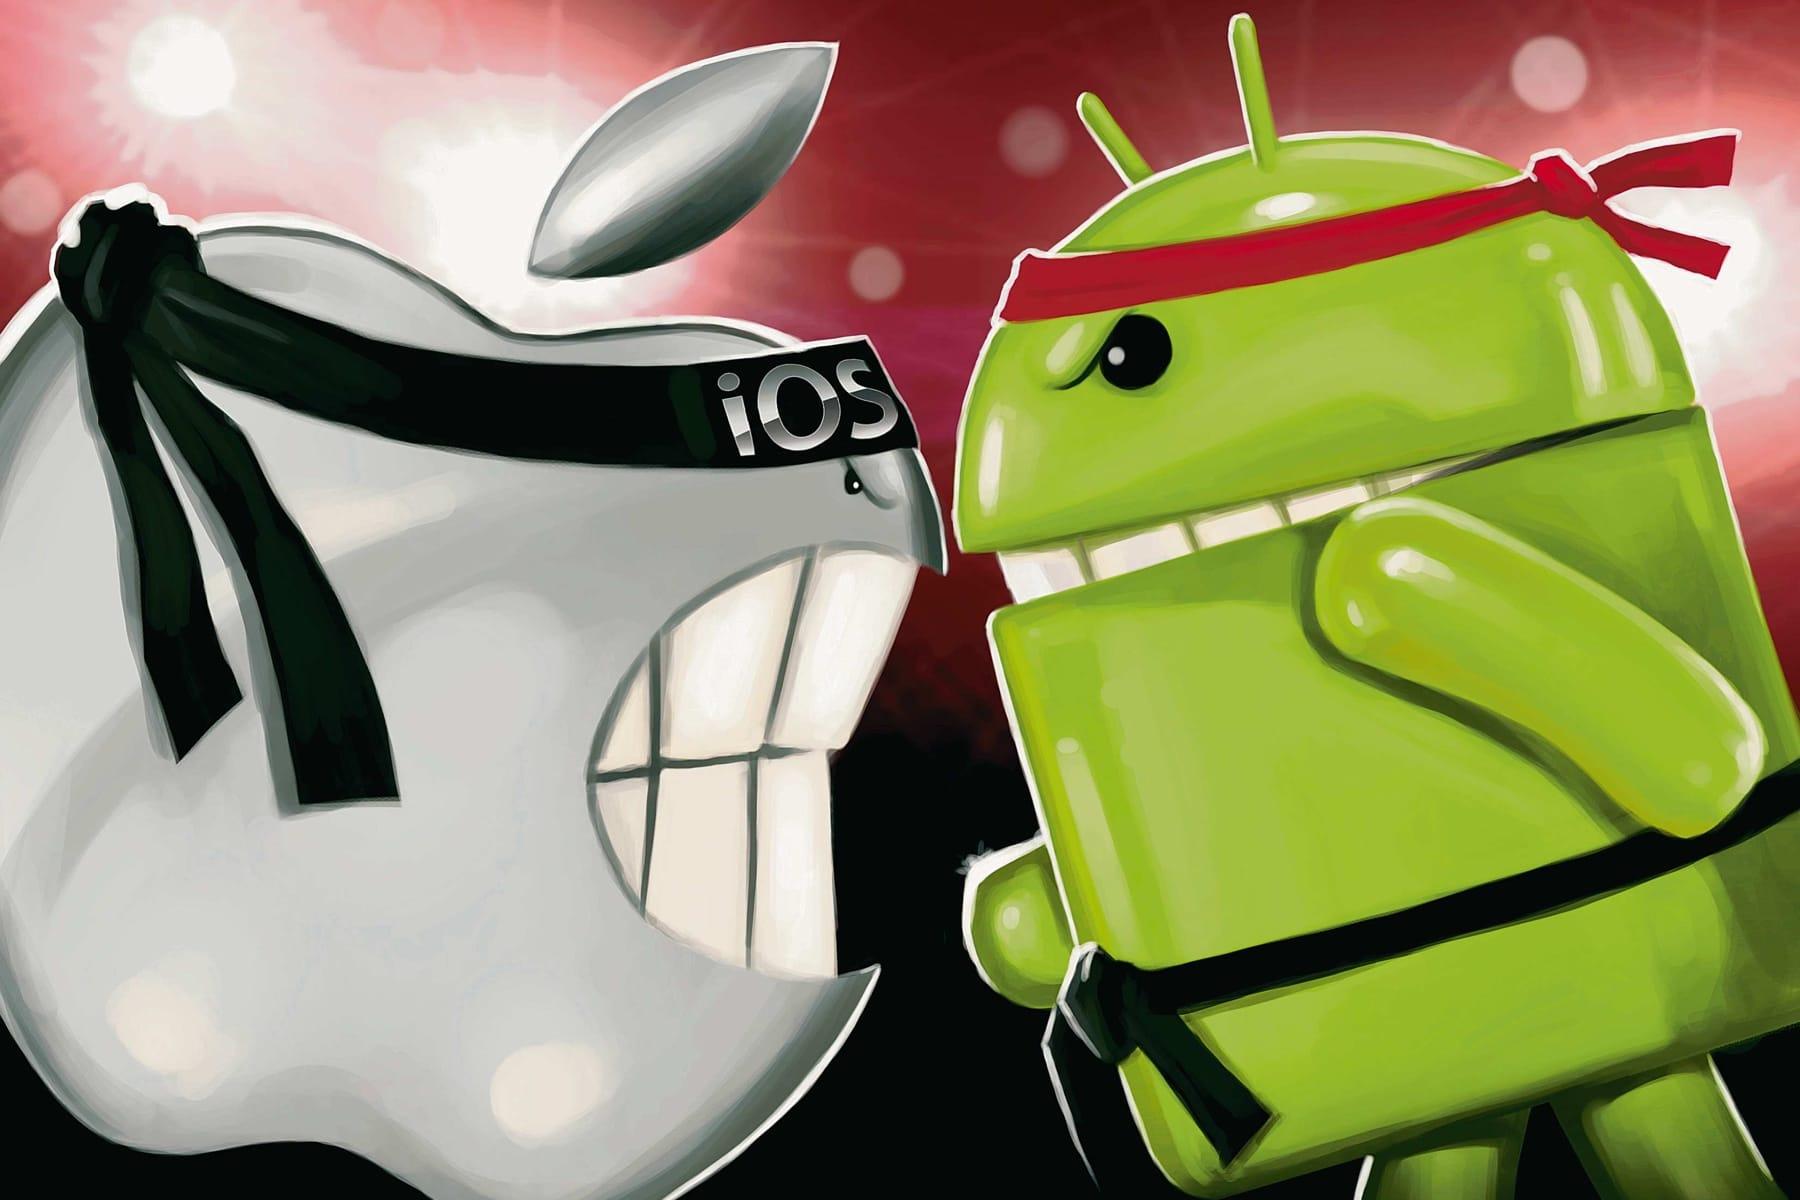 Почему камеру iPhone любят больше, чем Android?